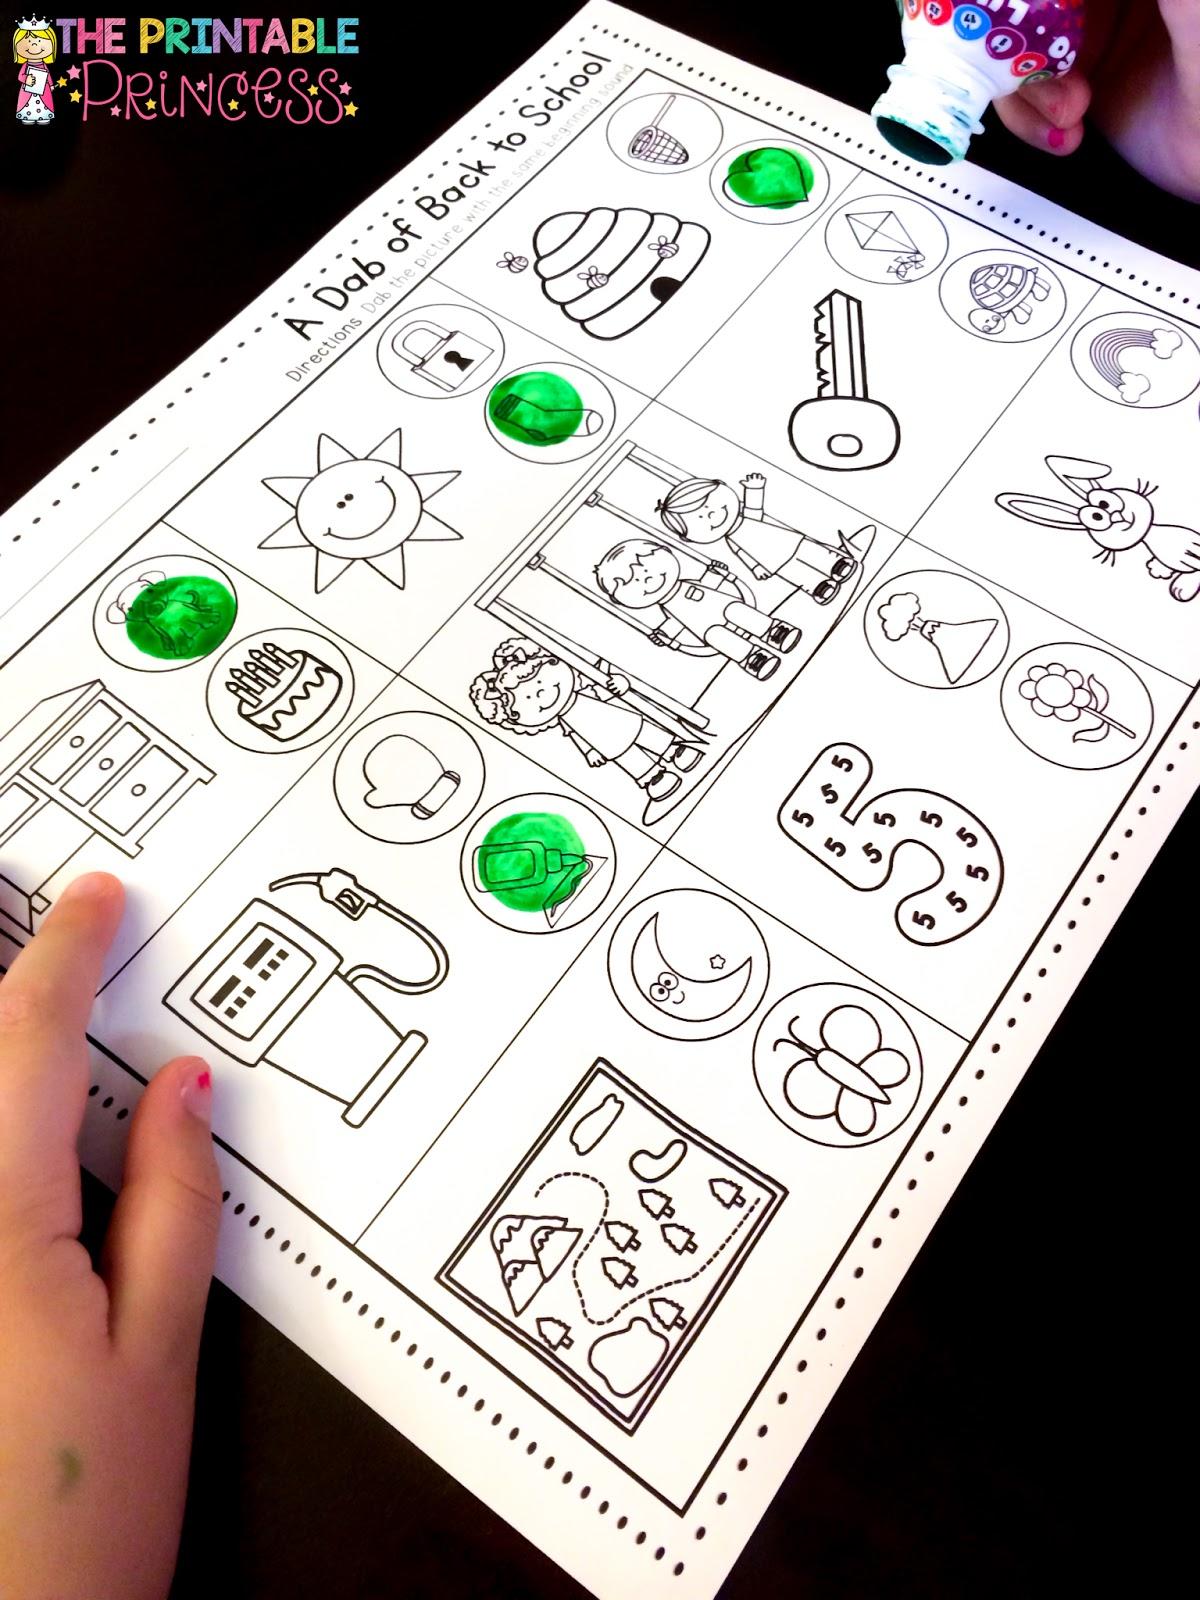 The Printable Princess Using Bingo Dabbers In The